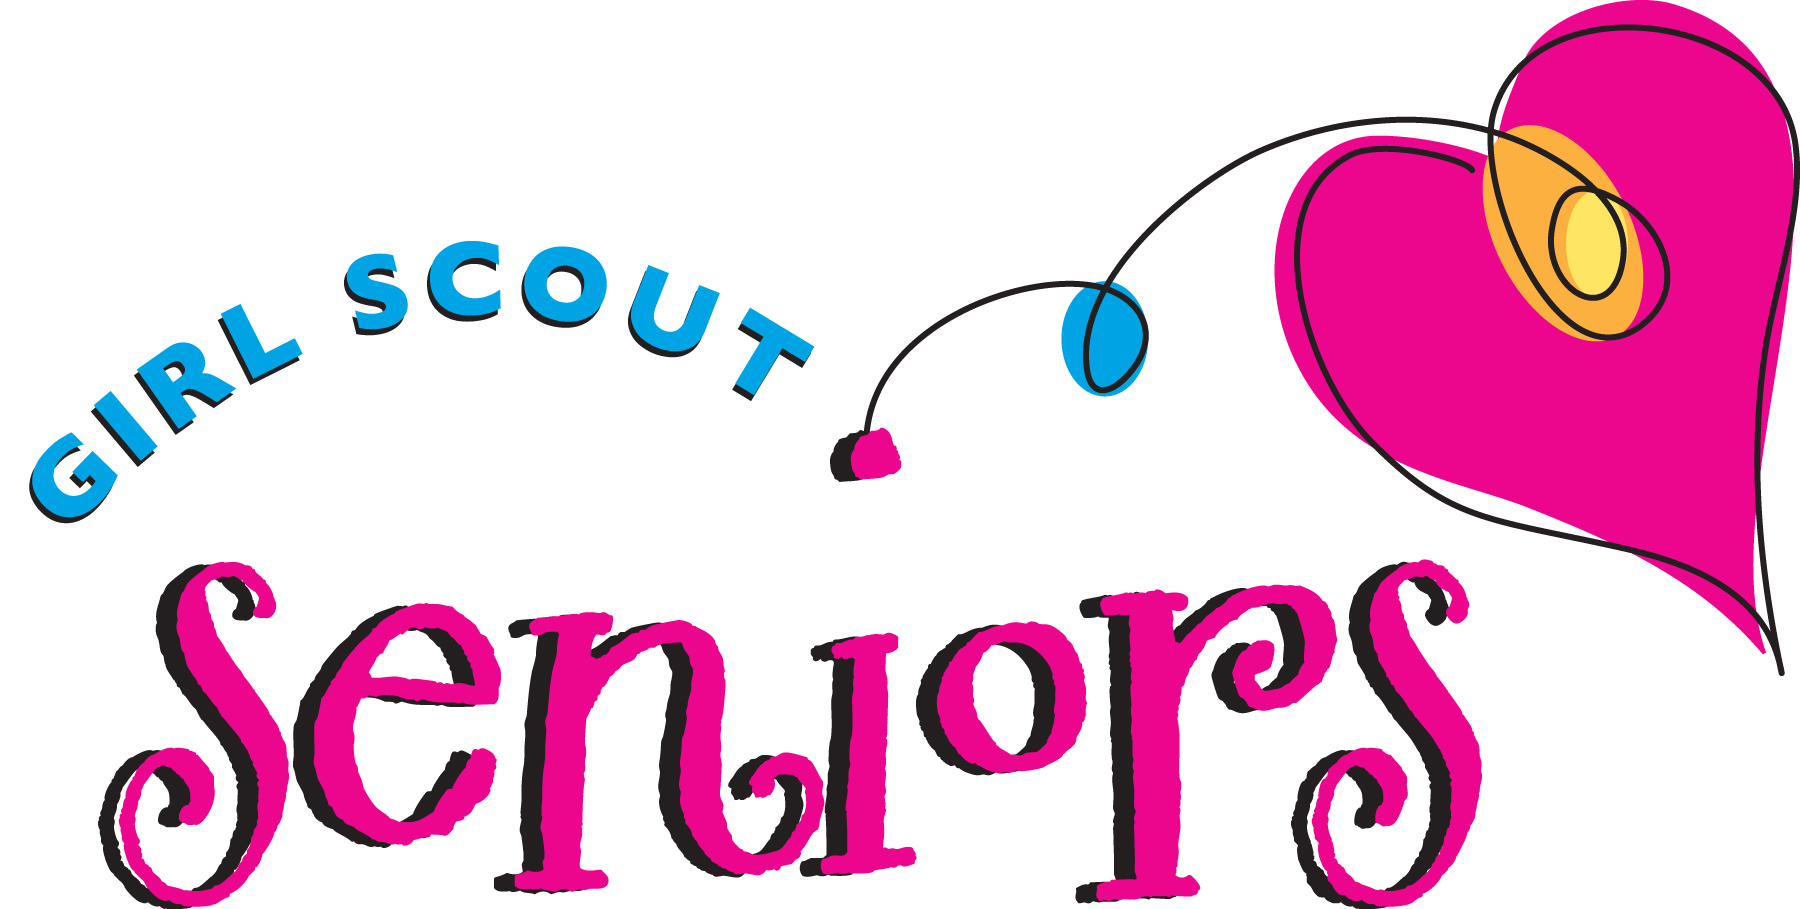 1800x909 Girl Scouts Pisgah United Methodist Church